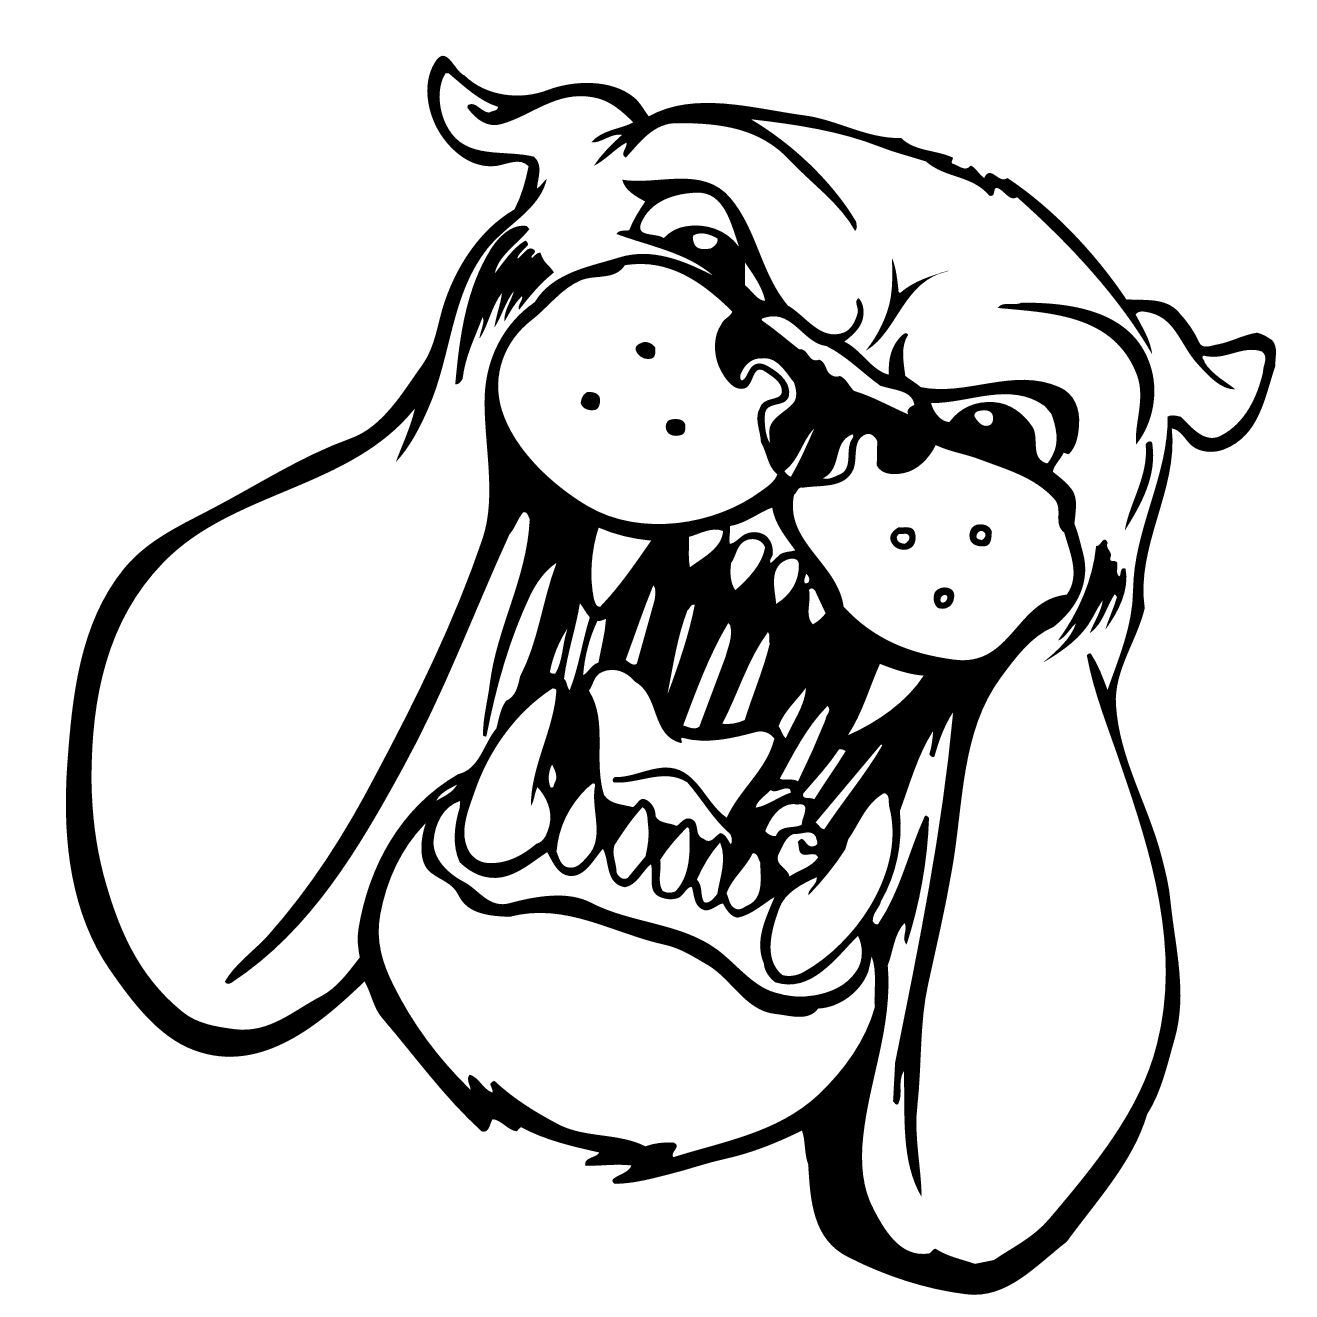 Bulldog clipart free images 11